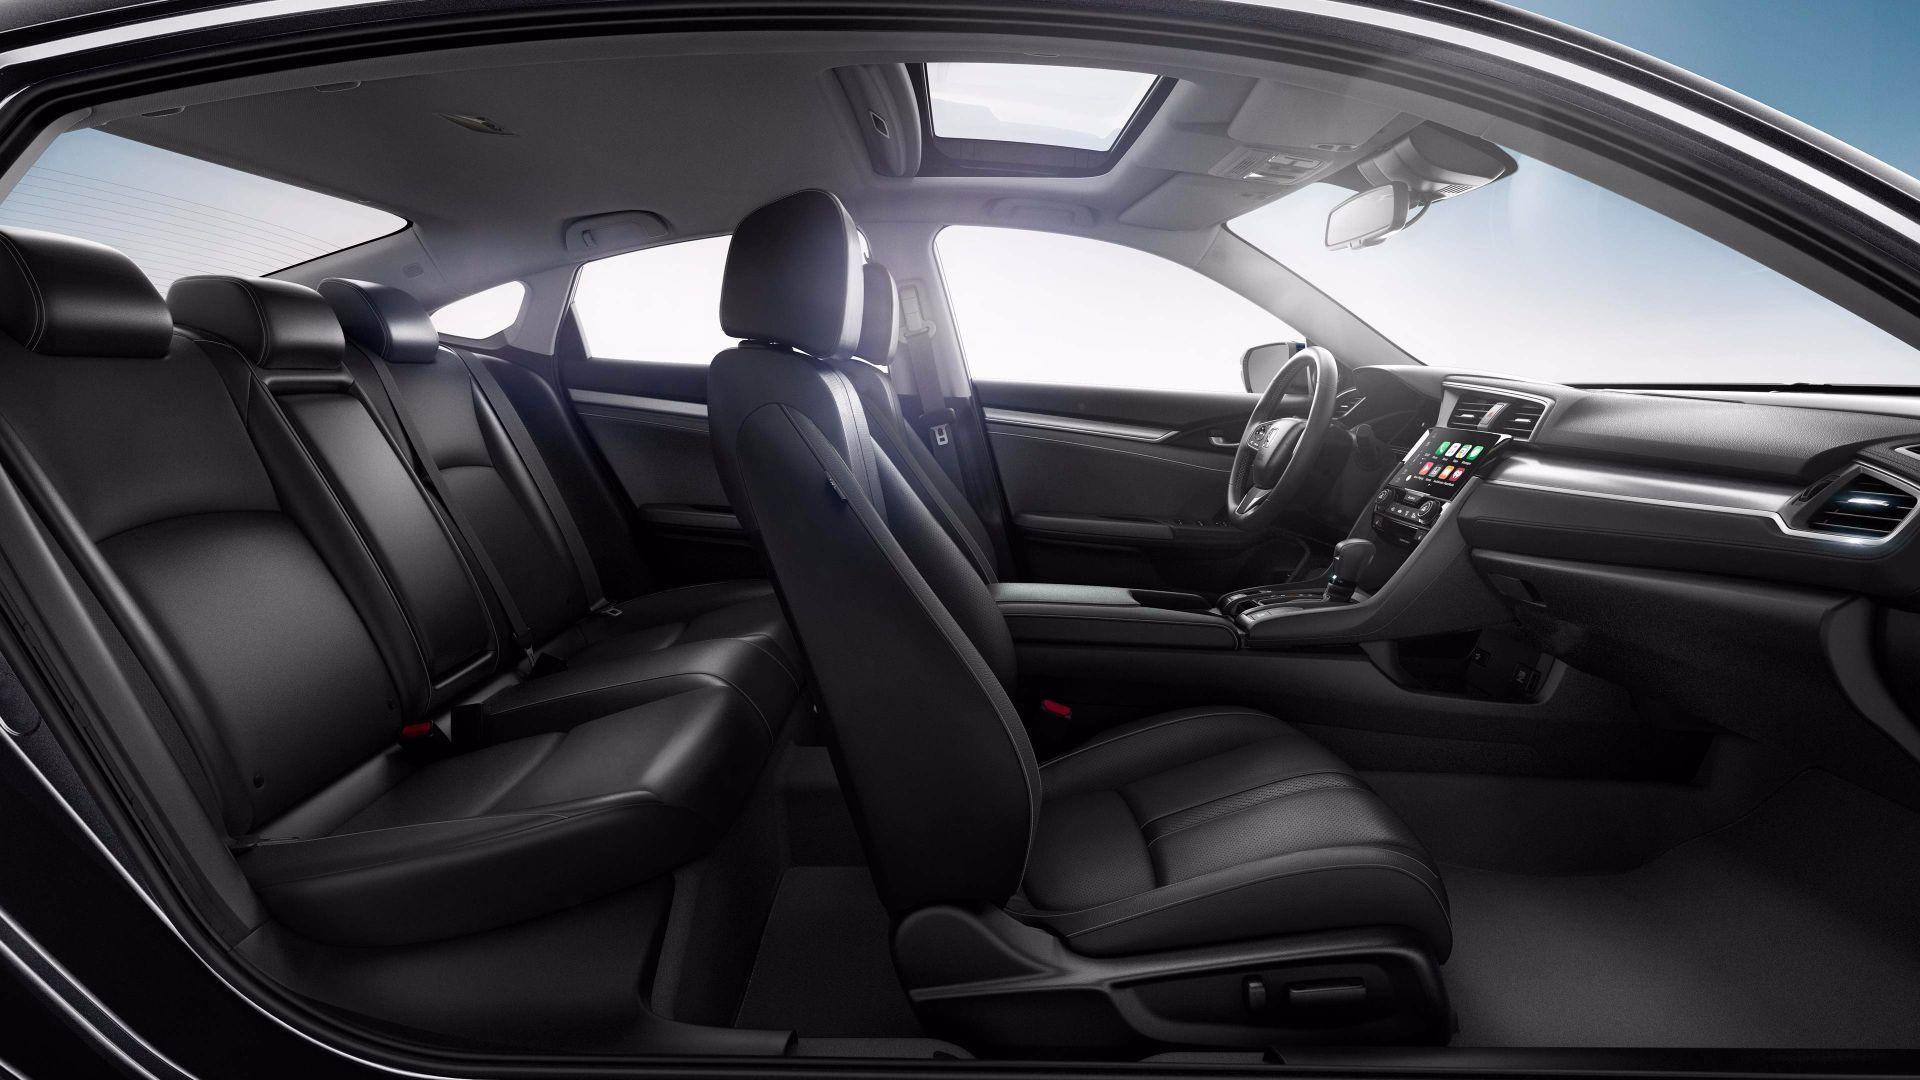 Corolla Vs Civic >> Toyota Corolla 2018 vs Honda Civic 2018 | Sherbrooke Honda